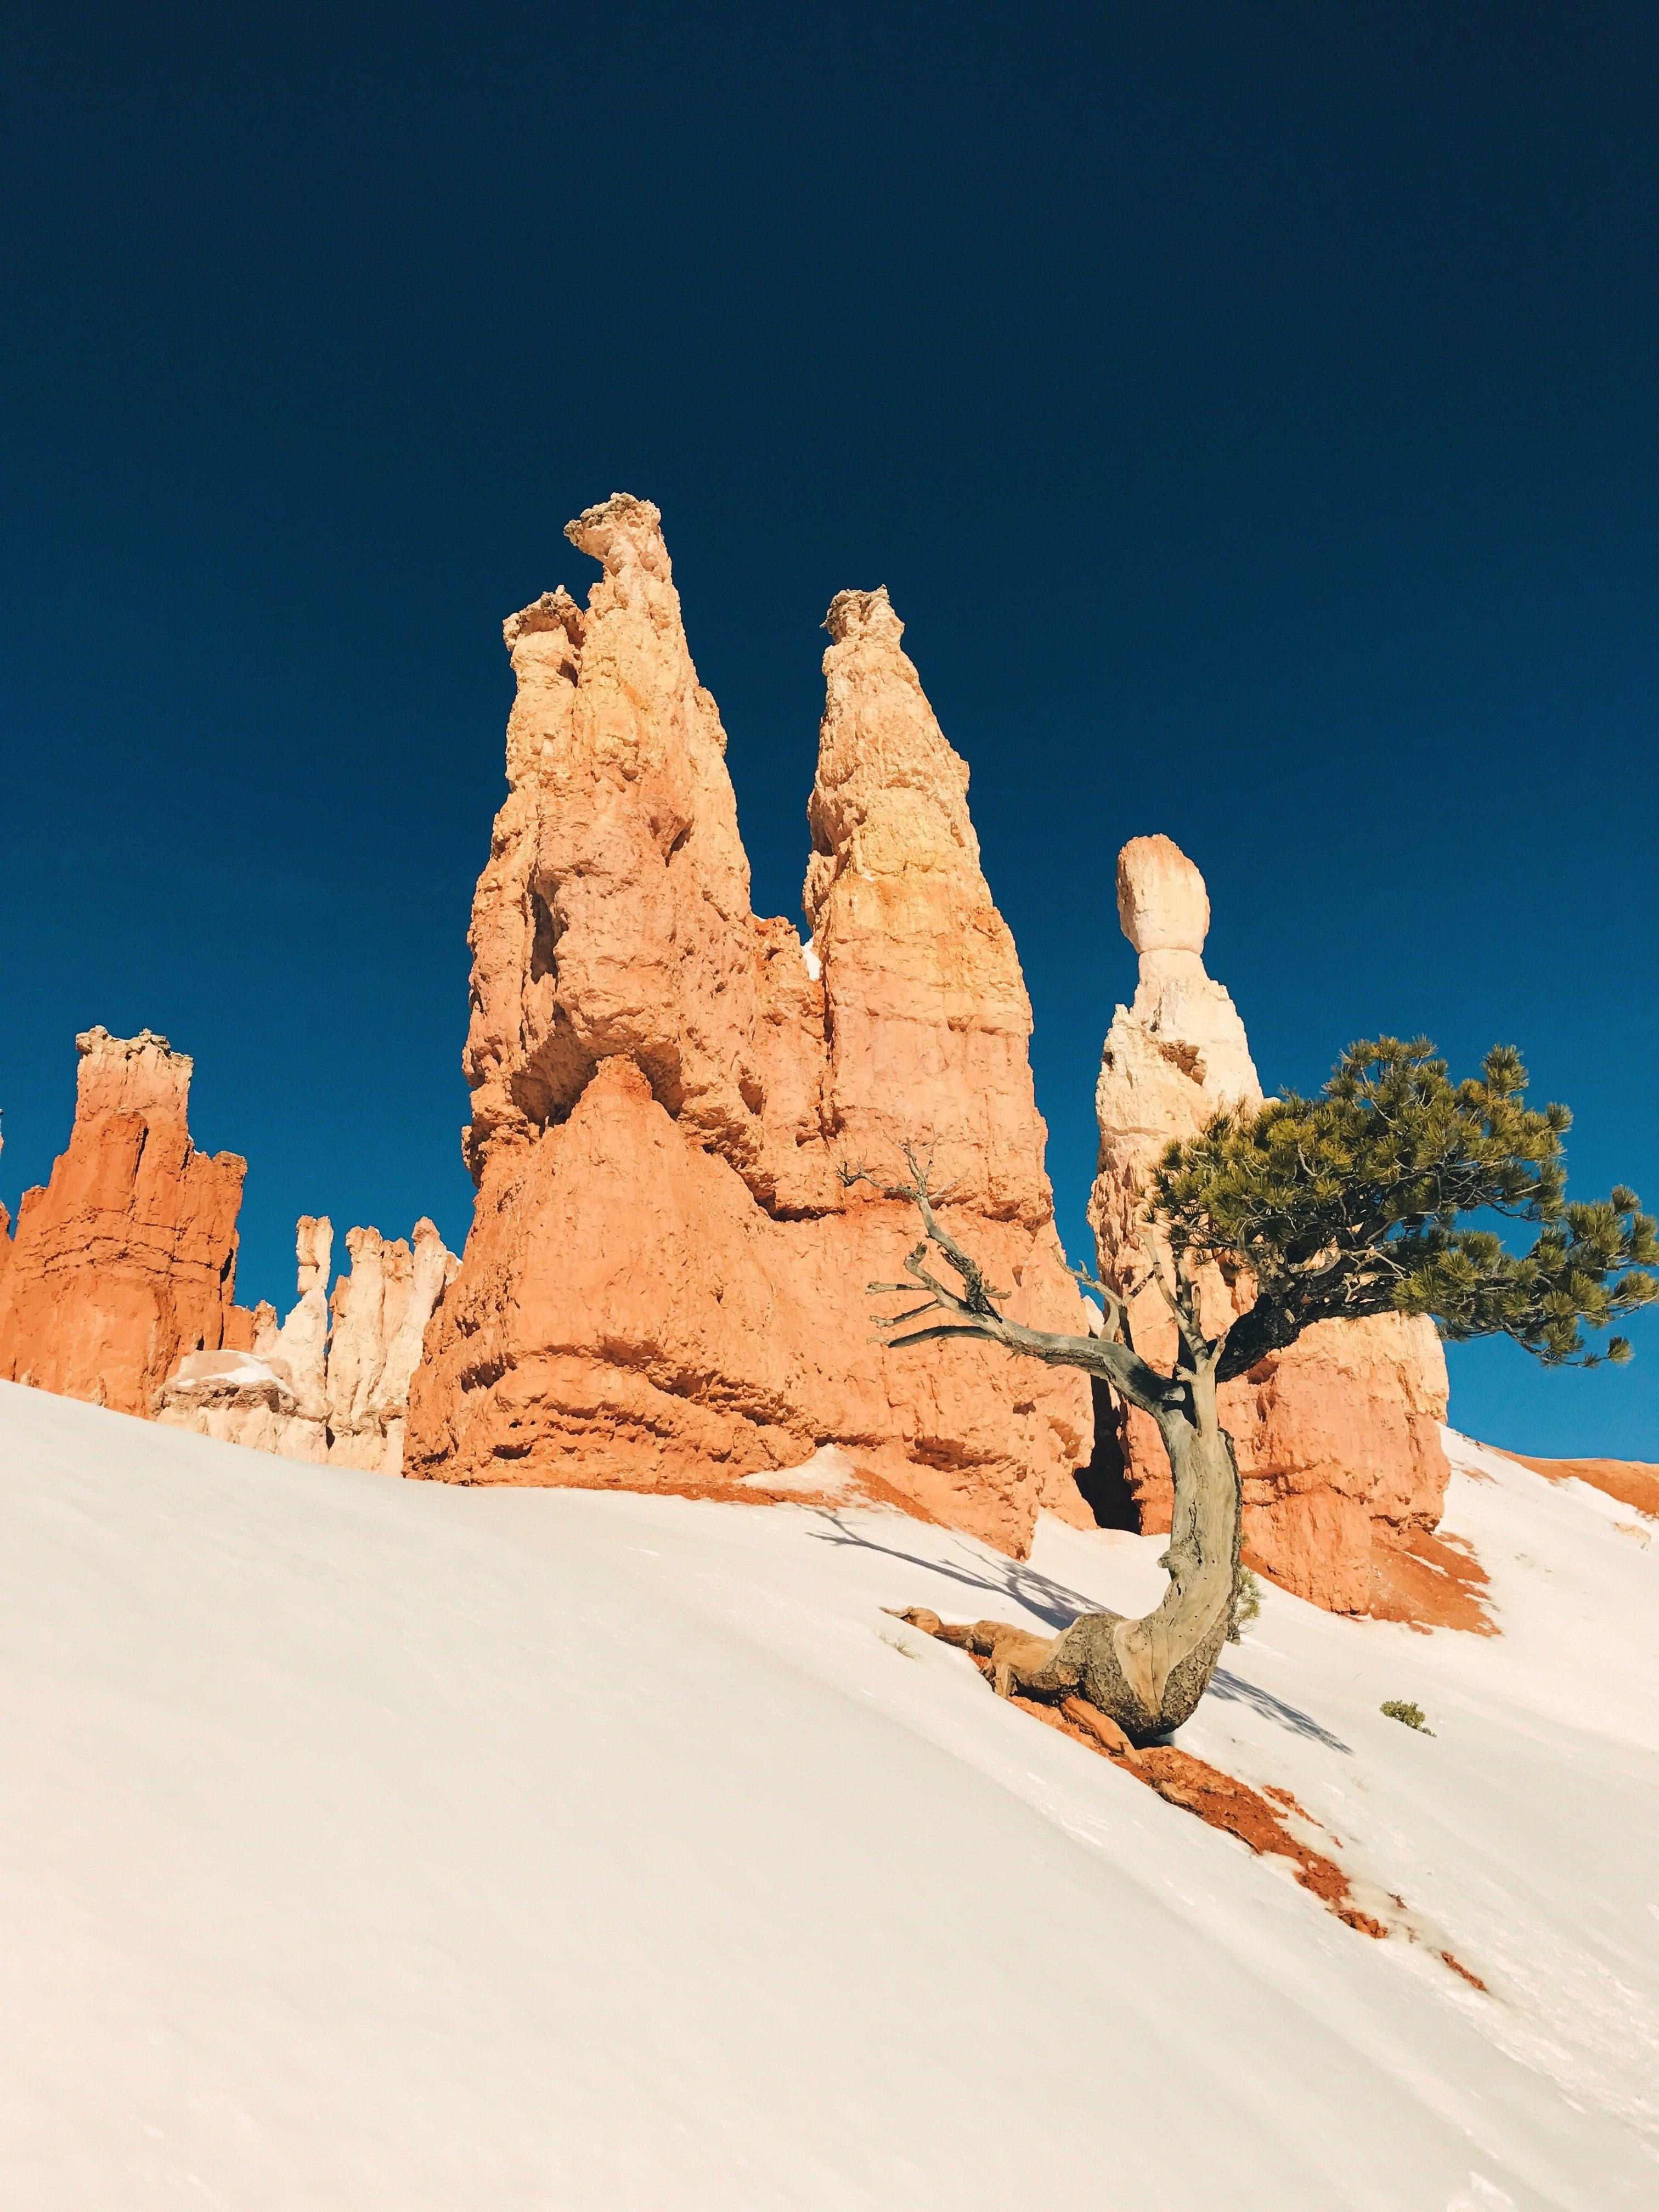 Bryce Canyon Iphone Wallpaper Idrop News